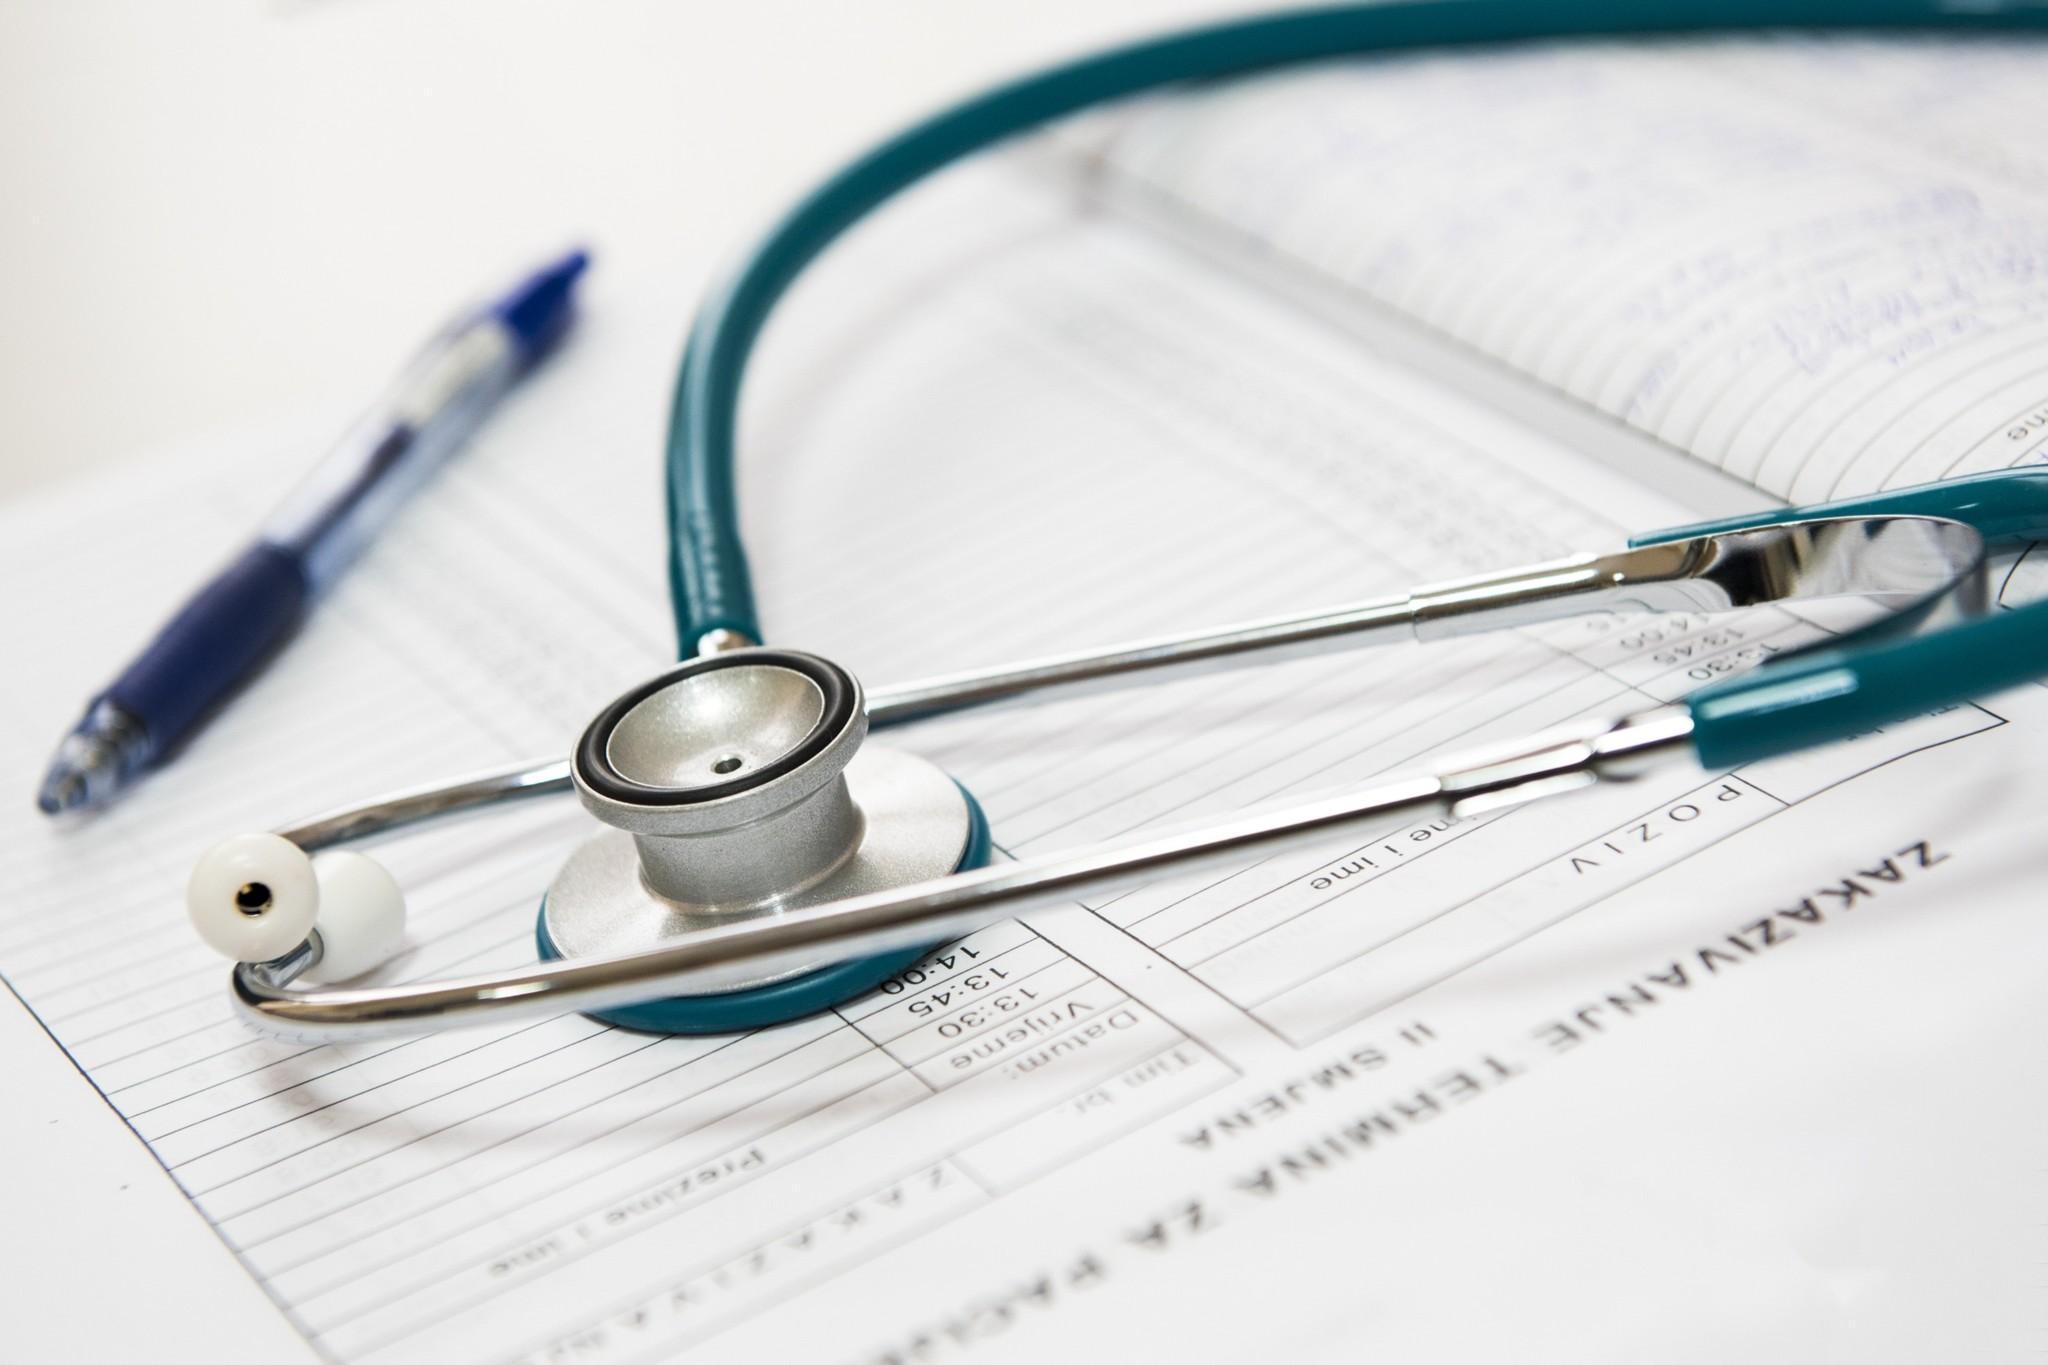 health stethoscope